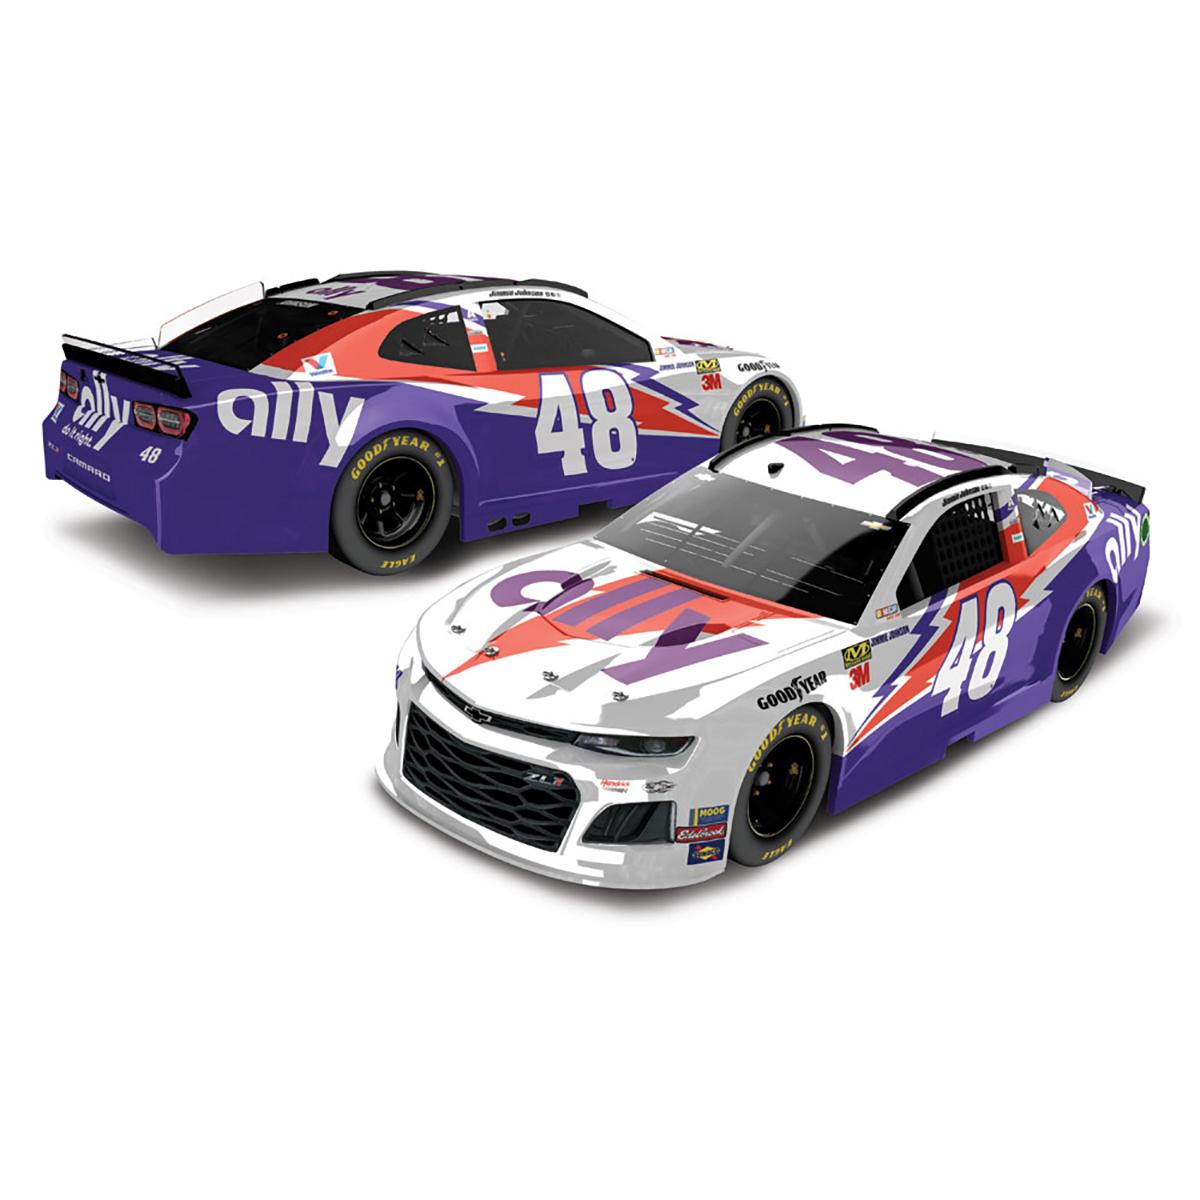 Jimmie Johnson #48 2019 Ally Darlington NASCAR HO 1:64 - Die Cast